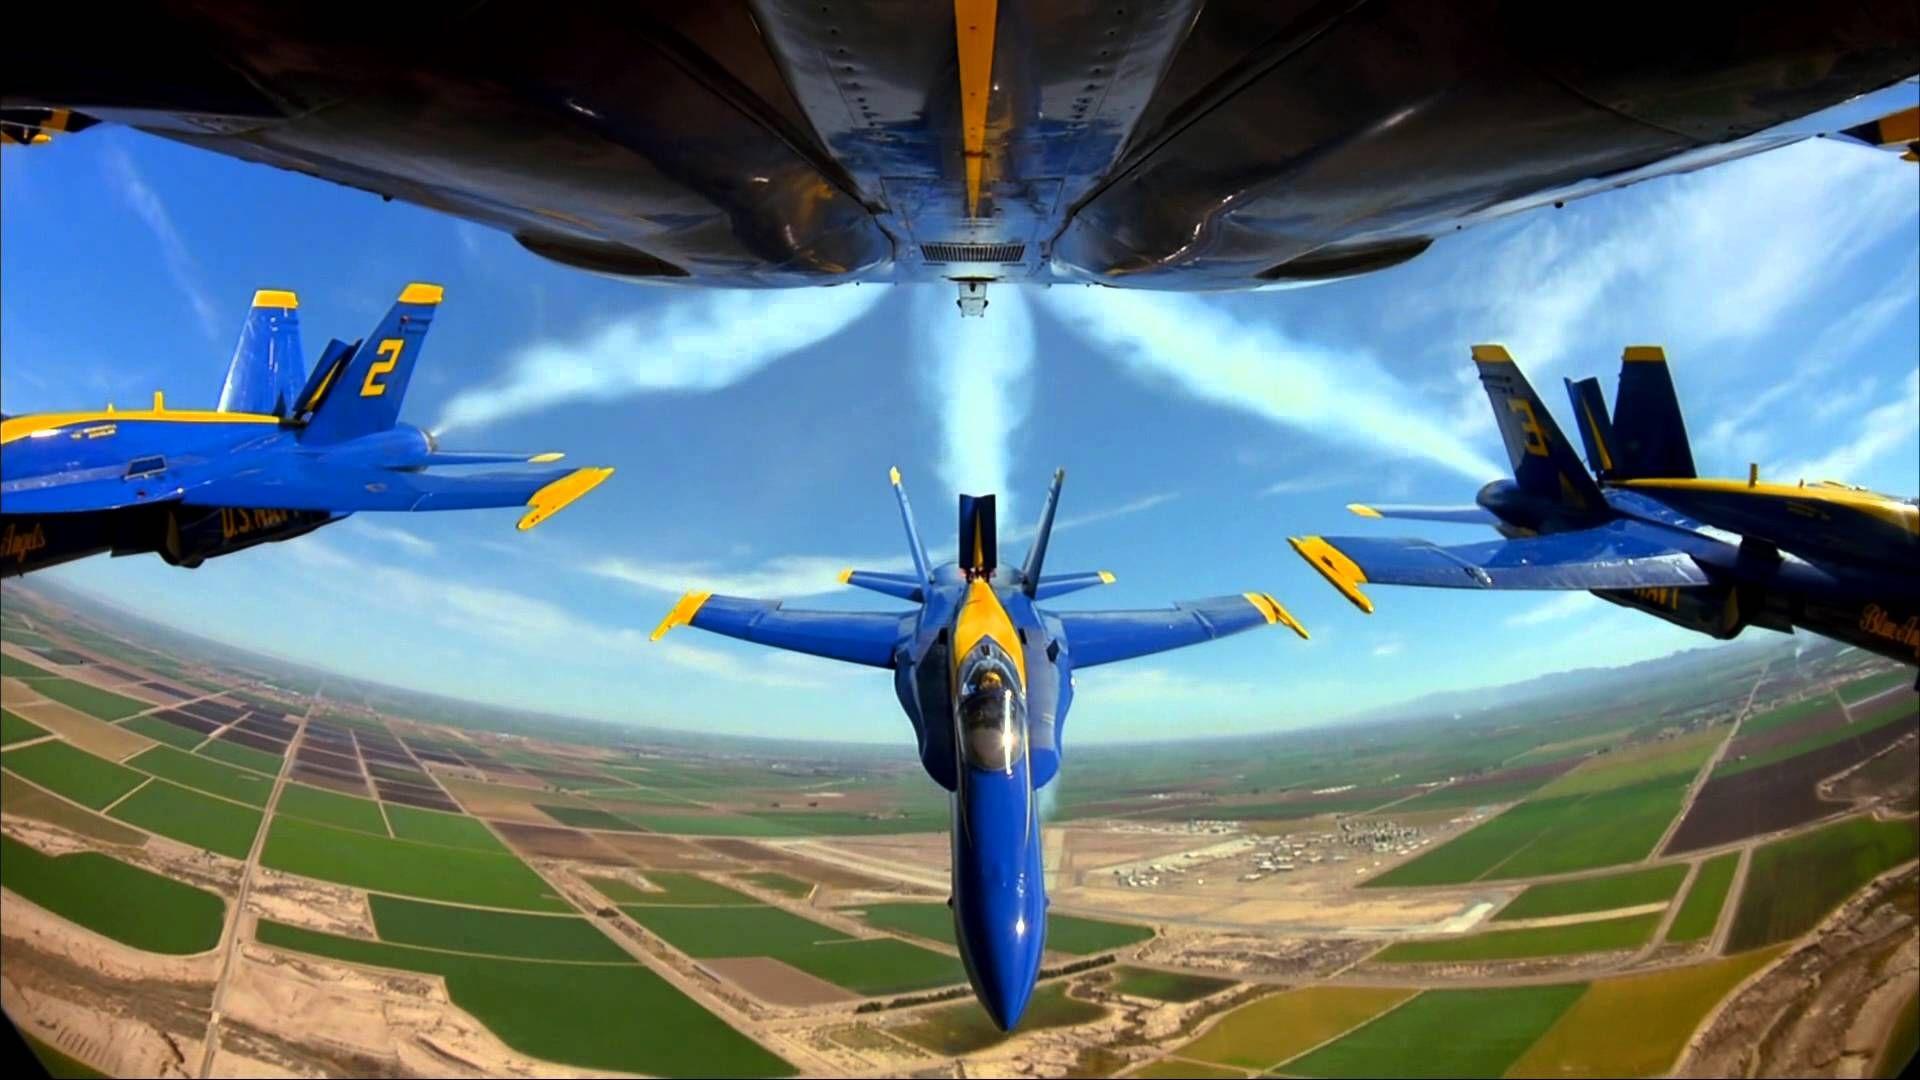 Blue Angels Air Show 1080p Blue angels air show, Blue